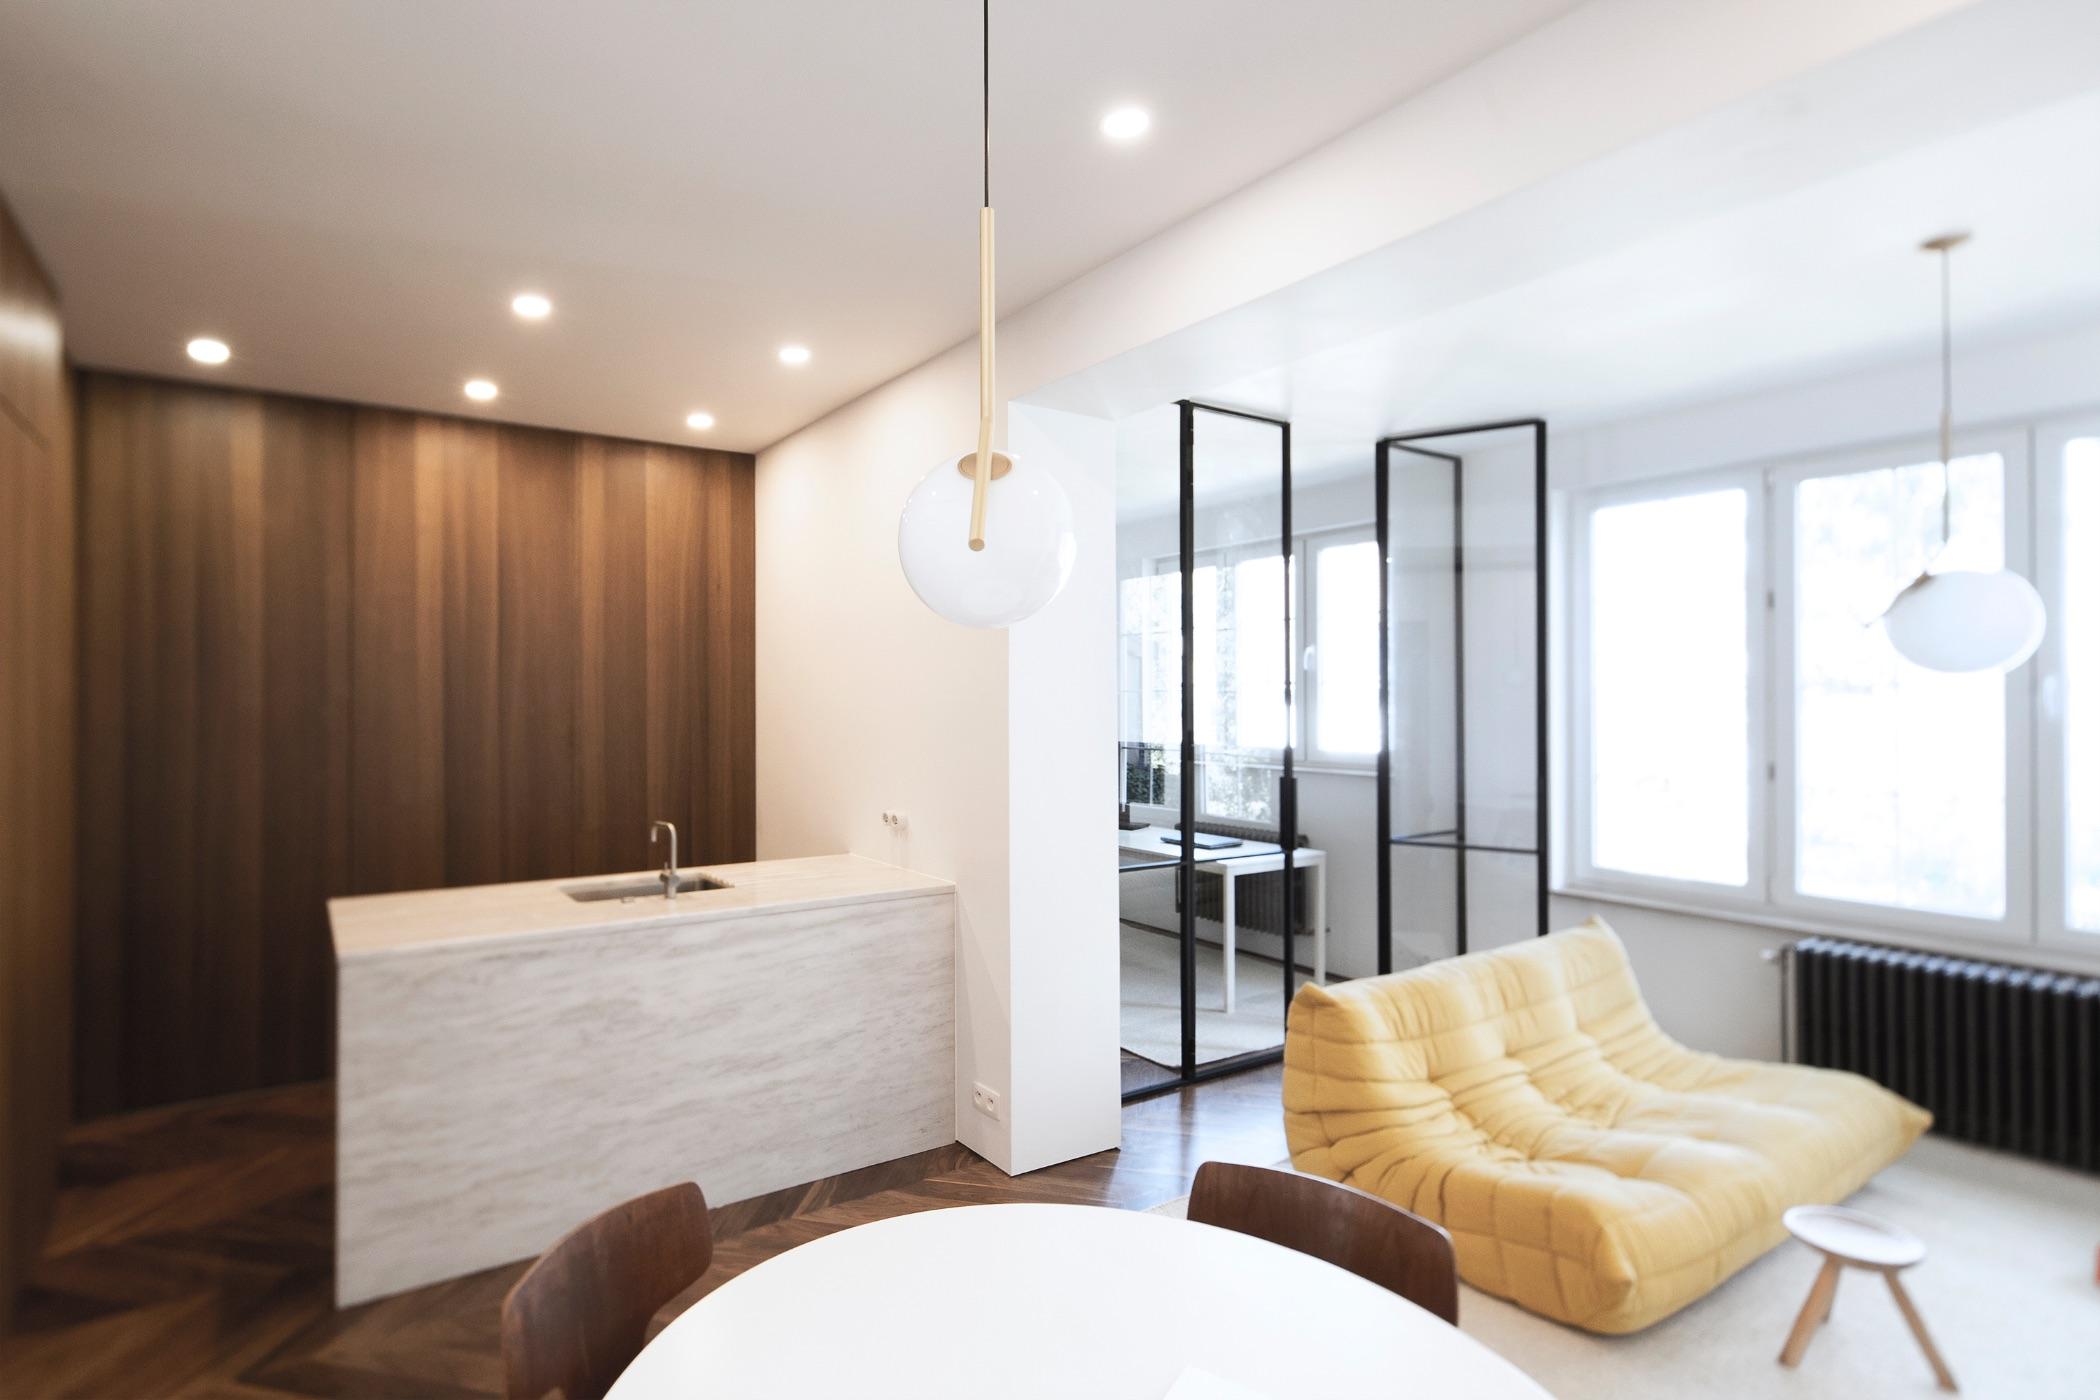 2_A&A's Apartment_Alexandru Patrichi_Inspirationist